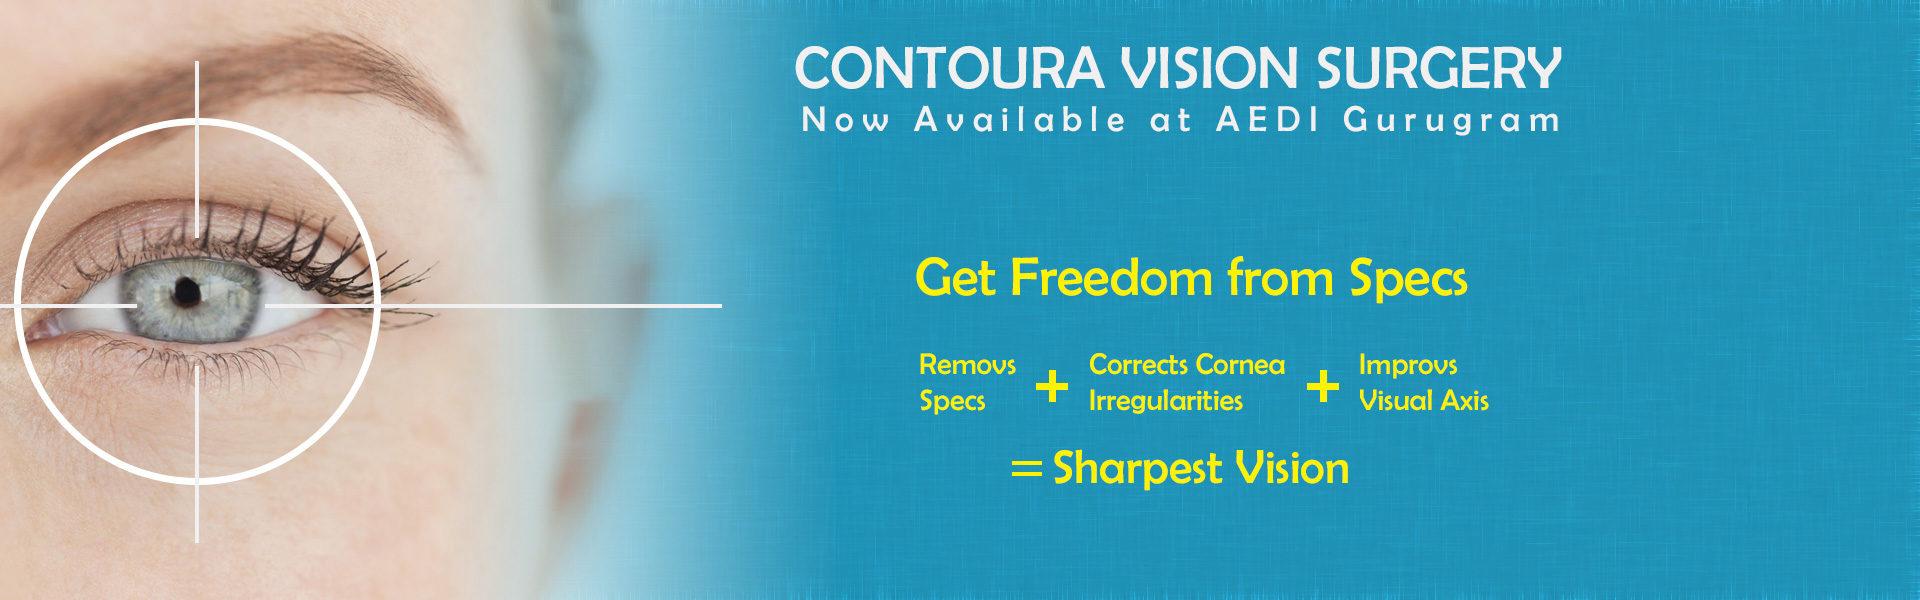 contoura-lasik-surgery